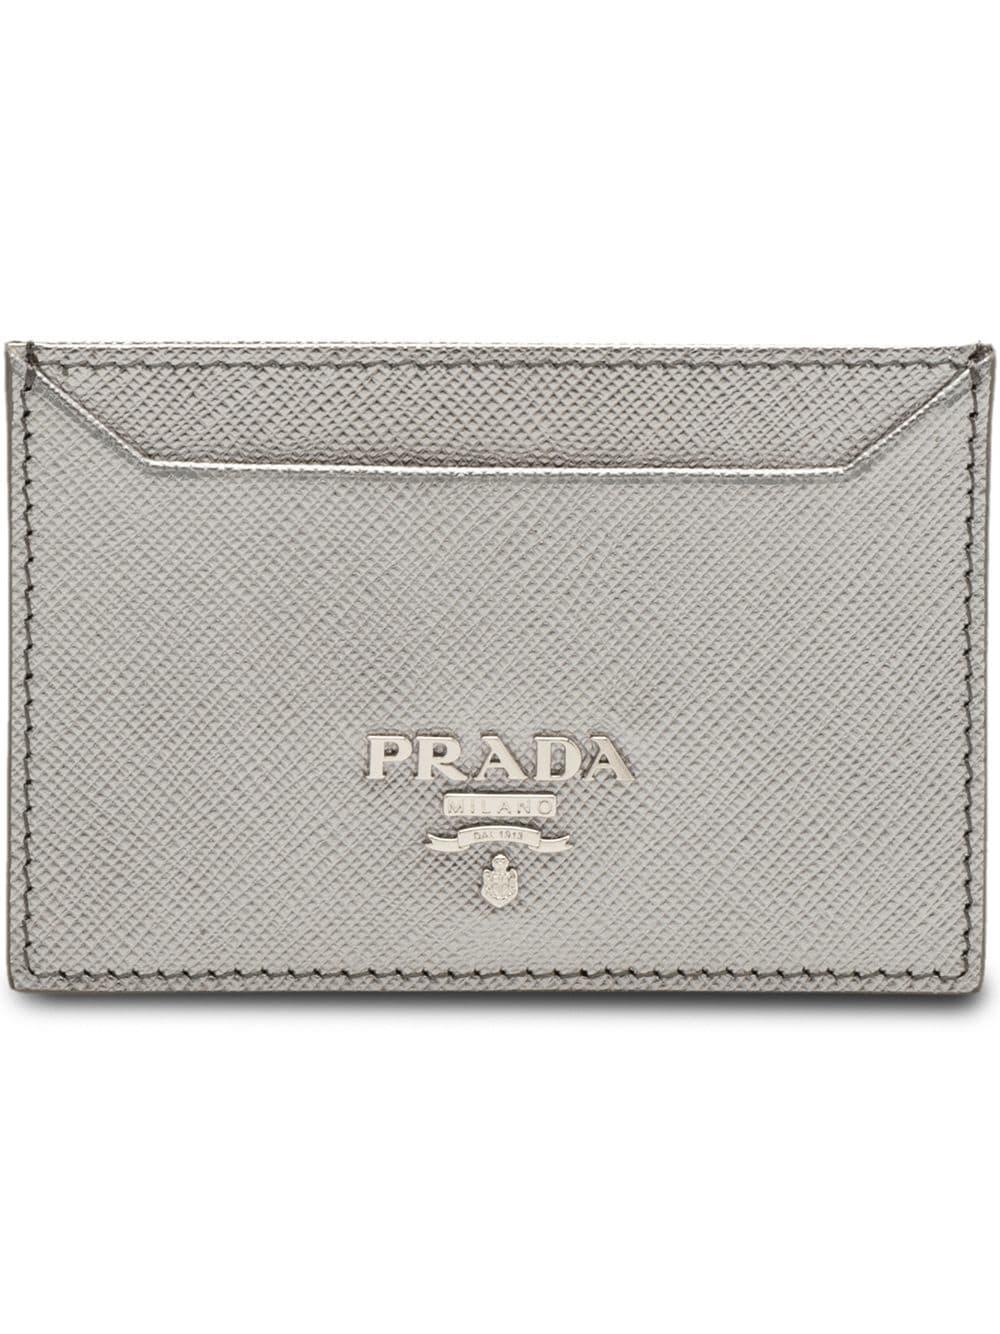 74203fccfcb8 Prada Logo Plaque Card Holder In Metallic   ModeSens